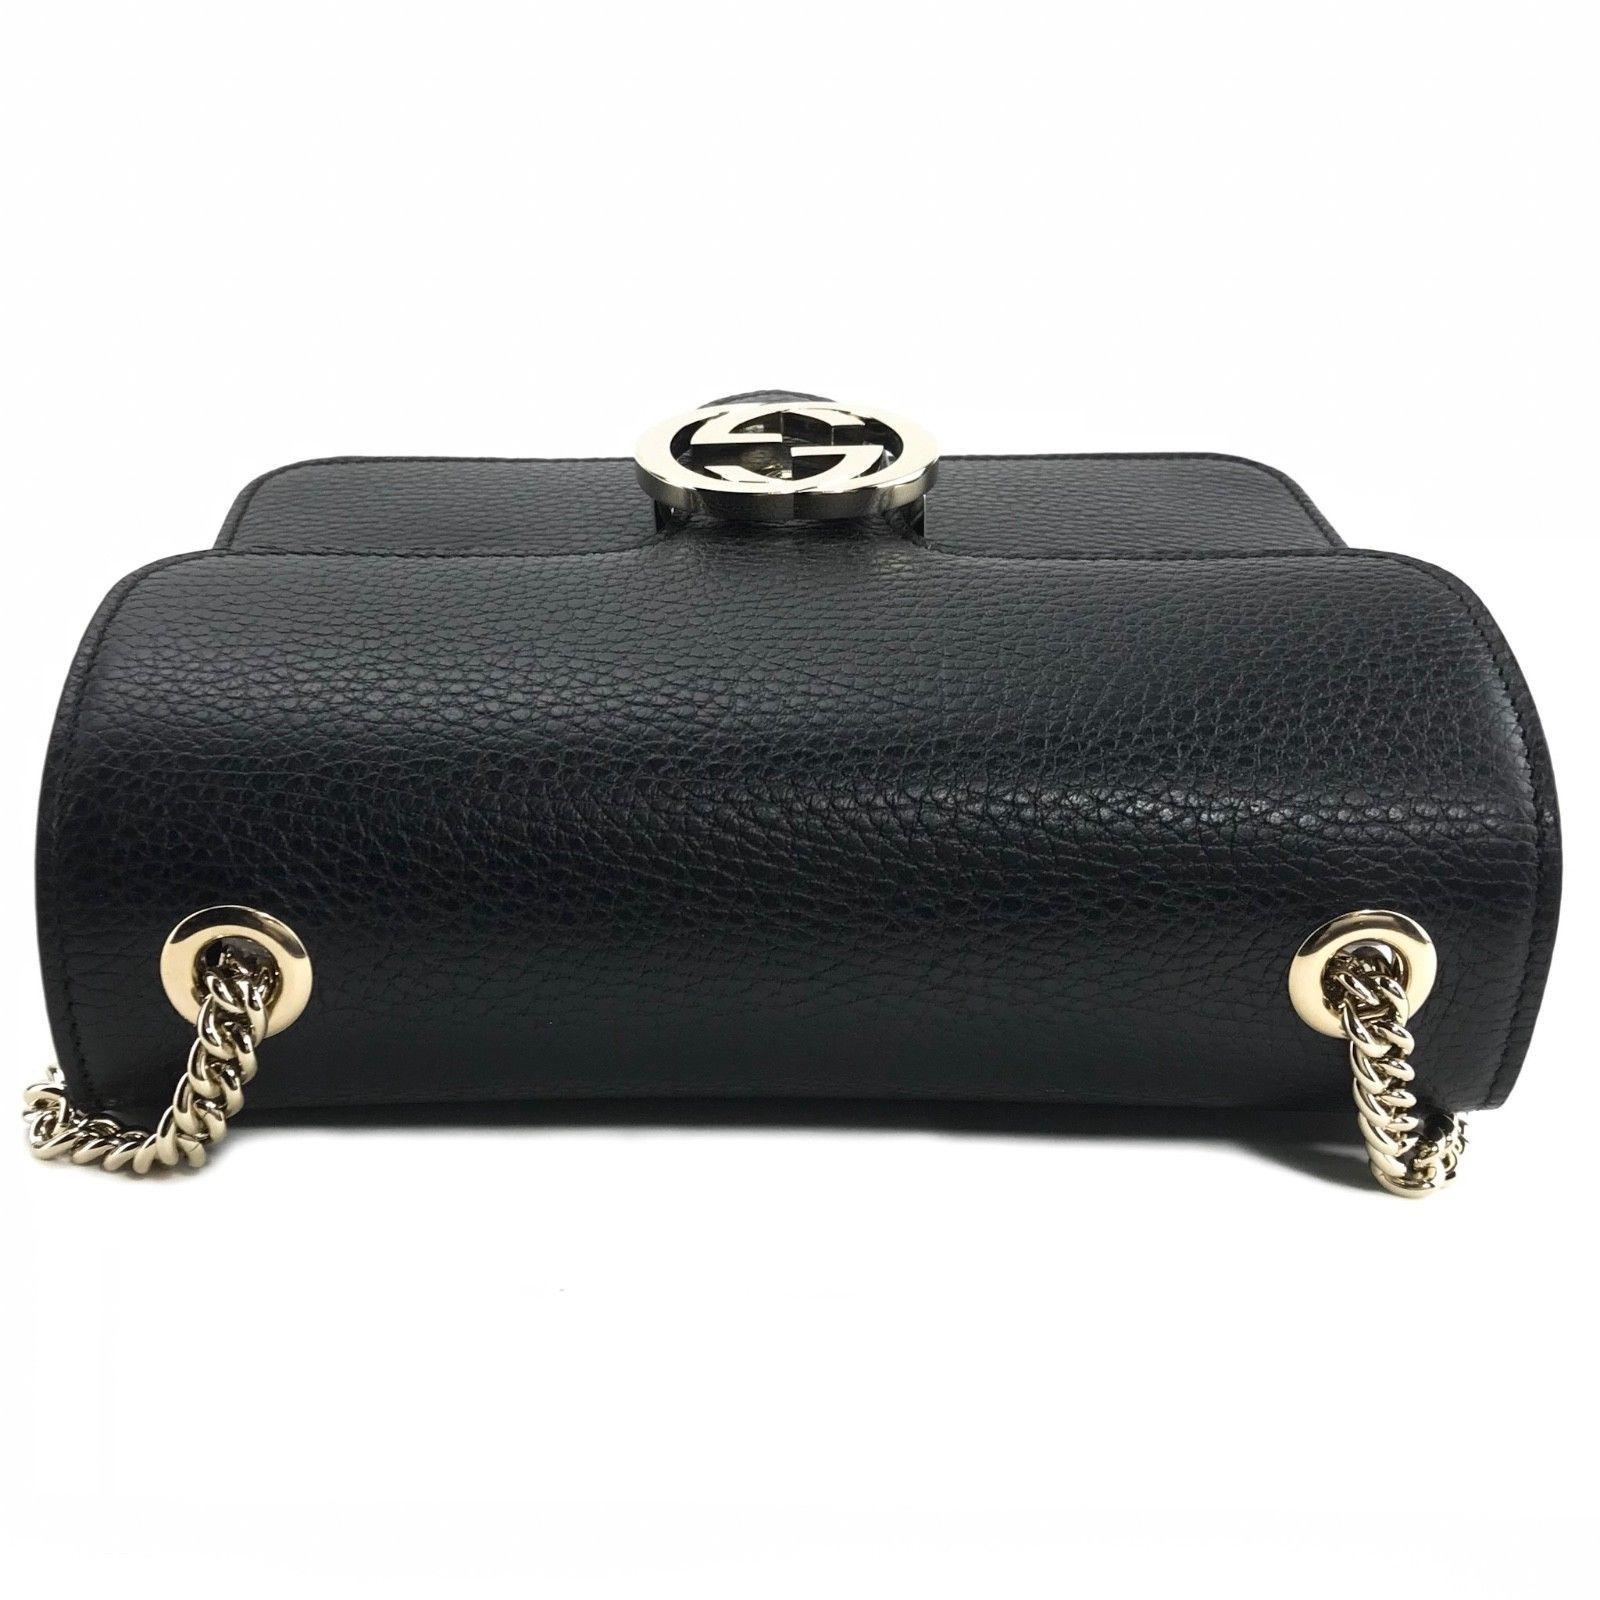 e501ba1ee NWT GUCCI 510304 Interlocking Leather Chain Crossbody Bag, Black